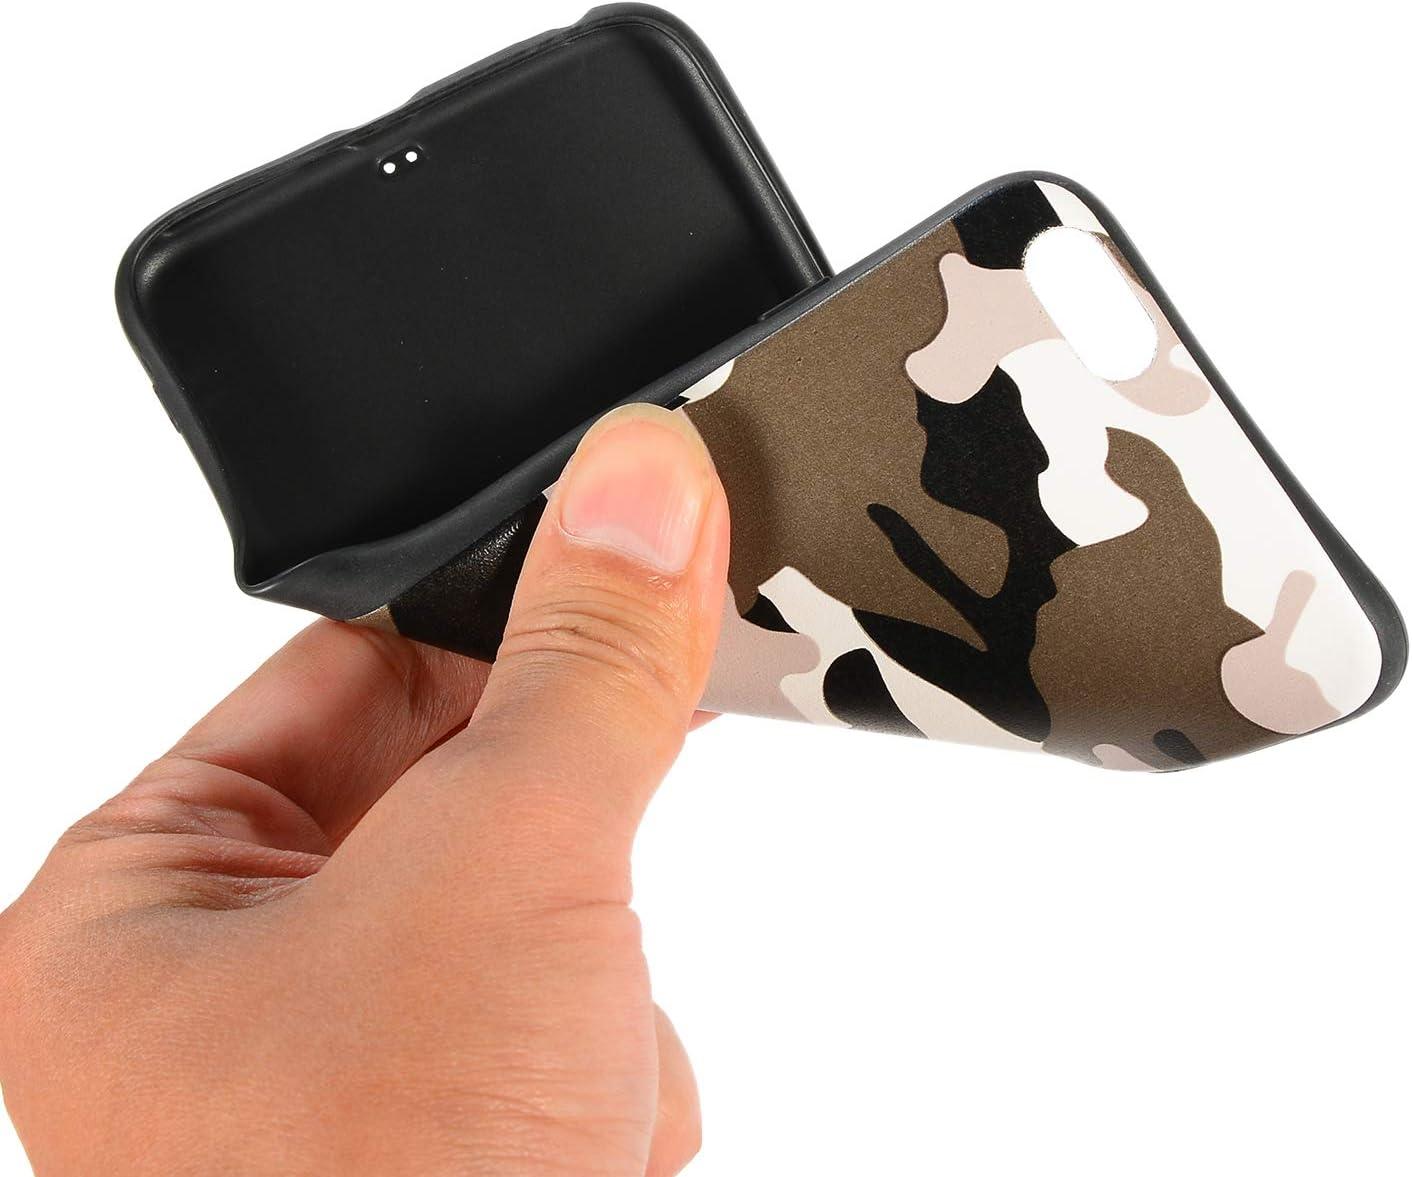 Everainy Kompatibel f/ür iPhone 6 Plus//iPhone 6S Plus H/ülle Silikon Bumper Gummi Cover H/üllen f/ür iPhone 6 Plus//iPhone 6S Plus Handyh/ülle Sto/ßfest TPU Sto/ßstange Schutzh/ülle Rauchen